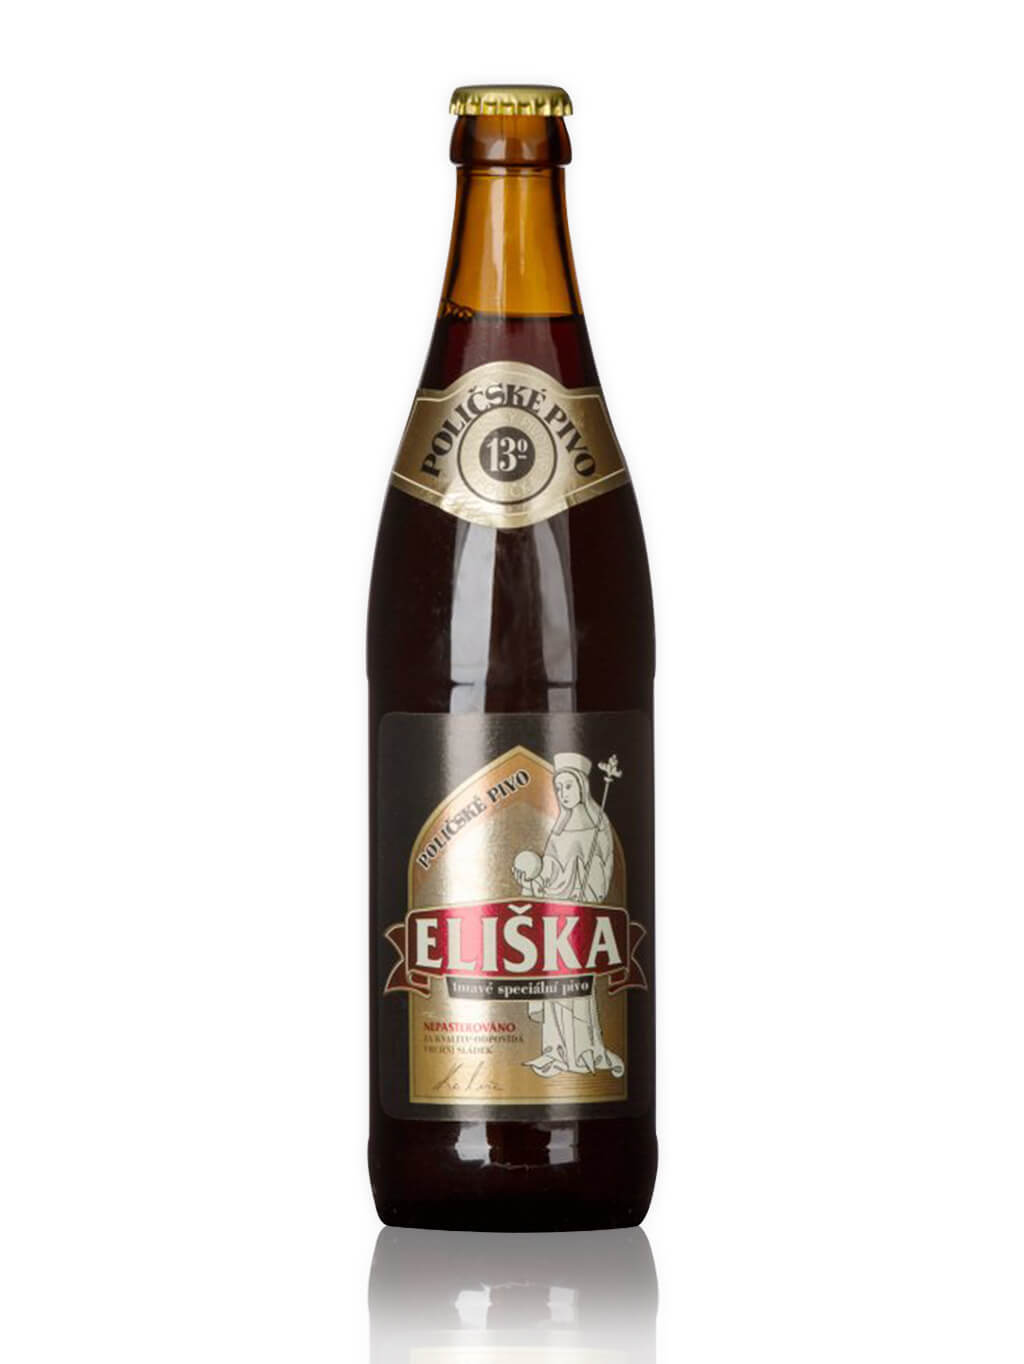 Polička-Eliška